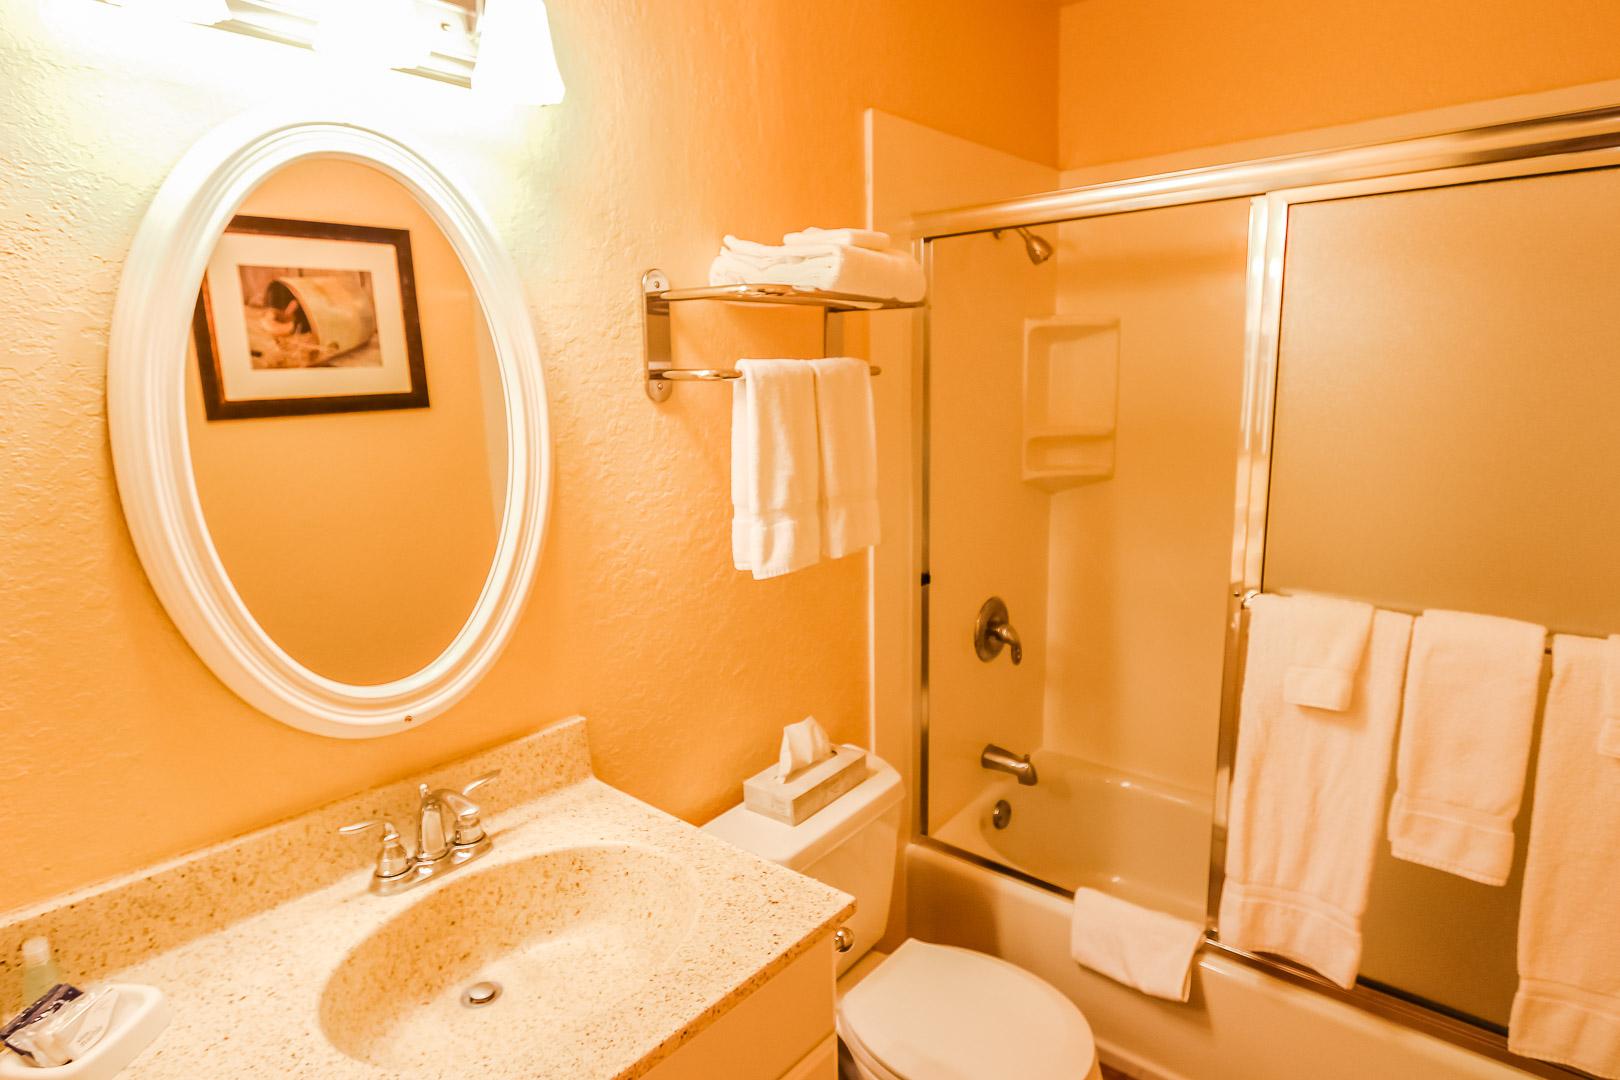 A vibrant and clean bathroom at VRI's Lake Arrowhead Chalets in California.